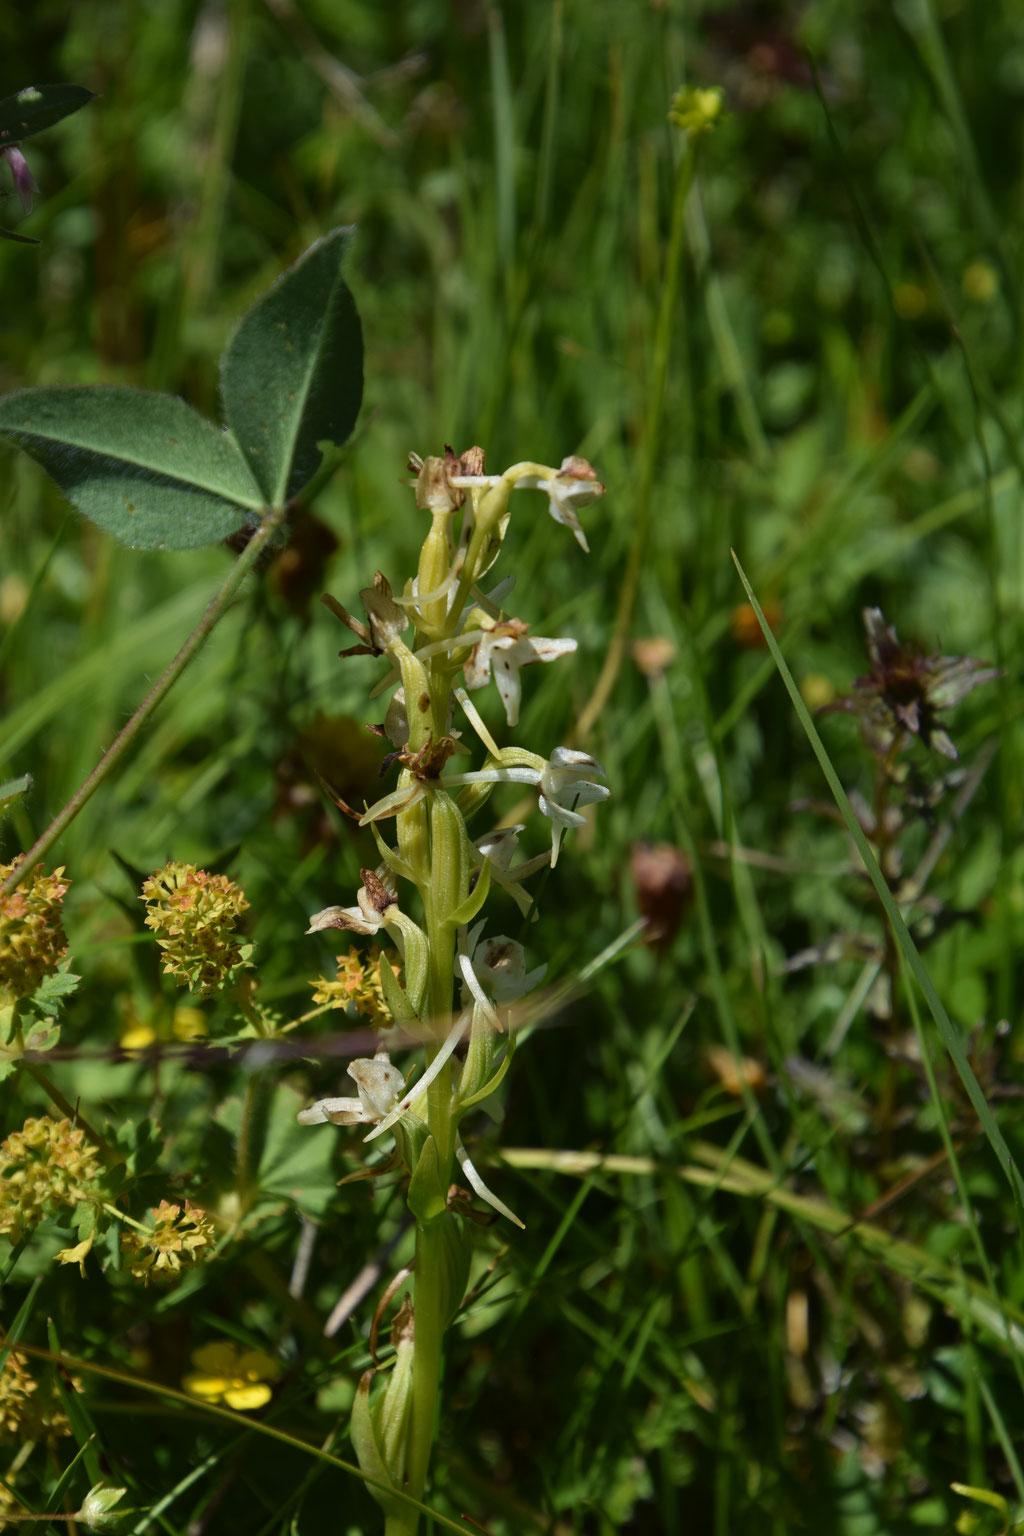 Plantathera bifolia - Welriekende nachtorchis